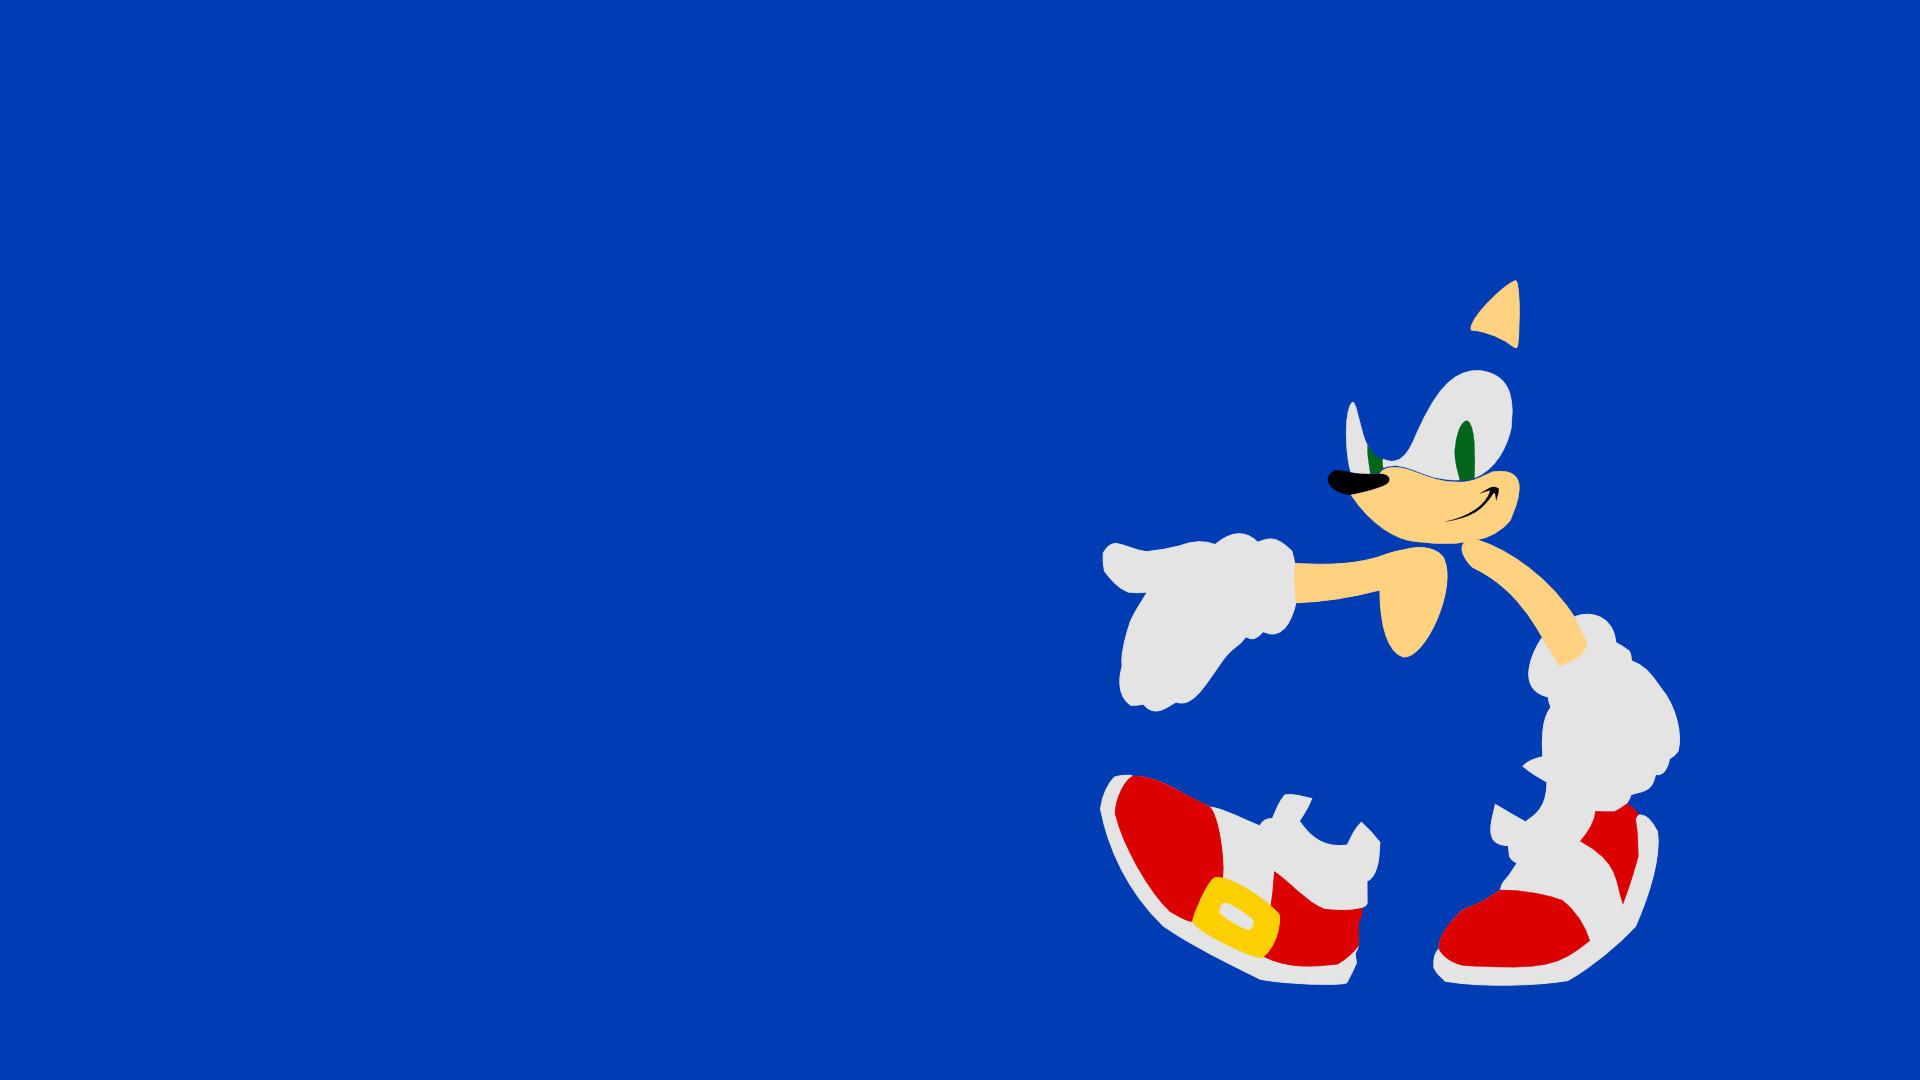 Sonic The Hedgehog Full HD Wallpaper